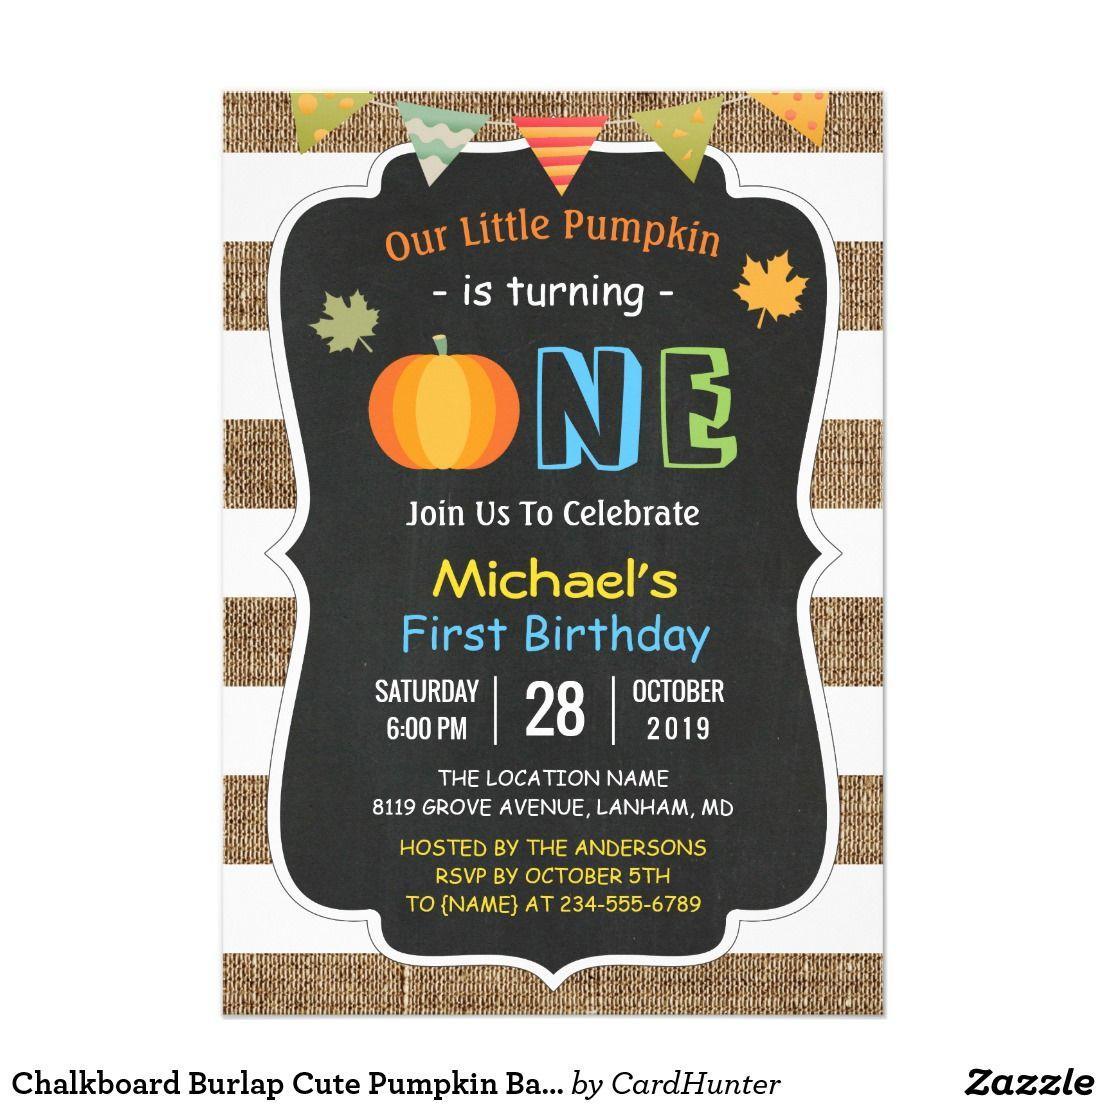 chalkboard burlap cute pumpkin baby first birthday card | miles